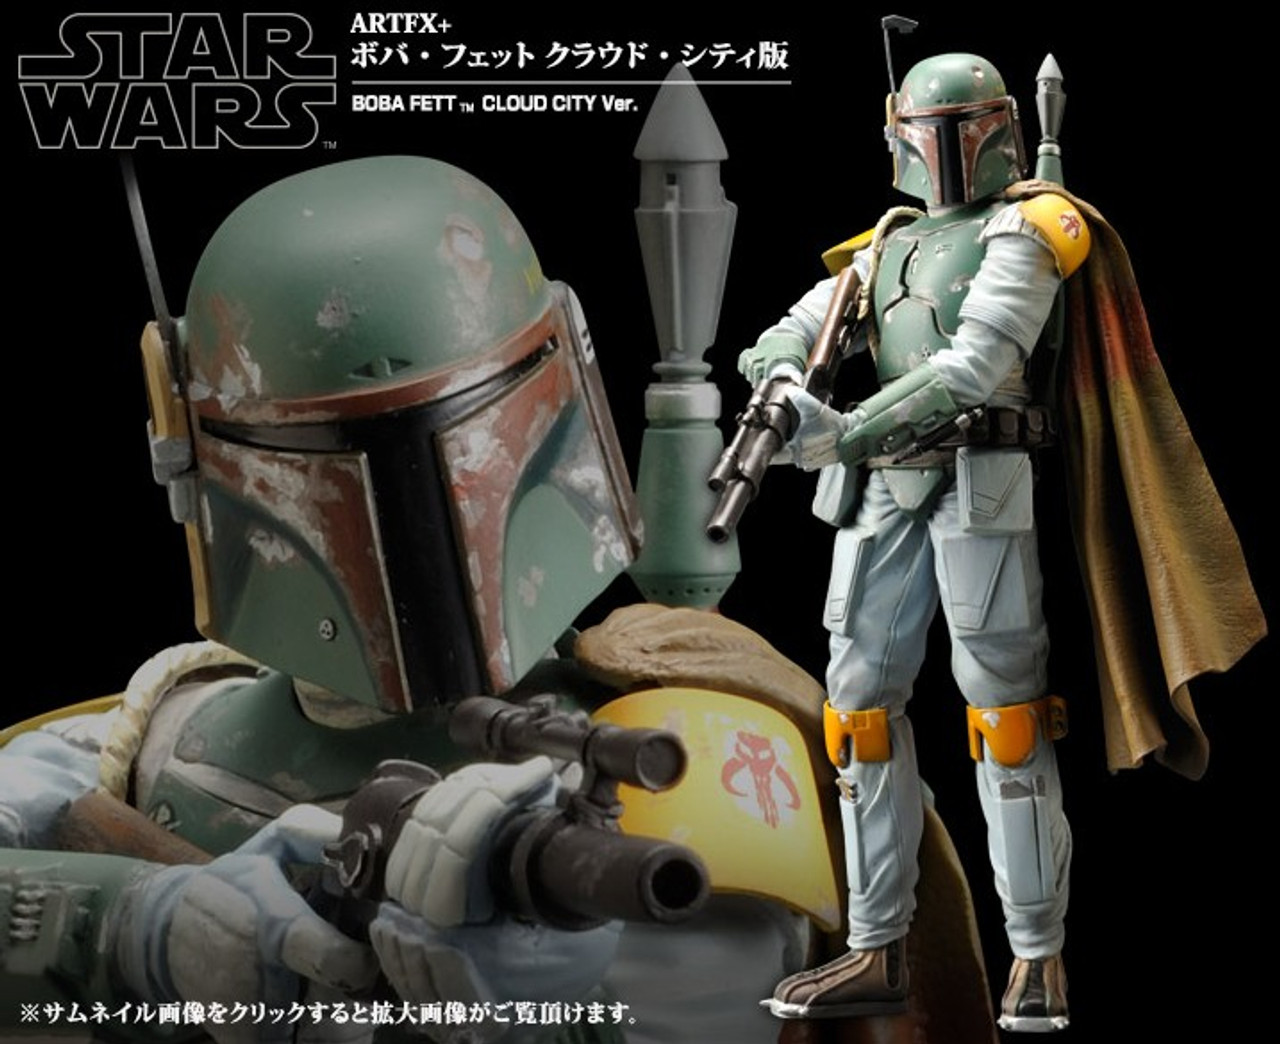 Star Wars Boba Fett PVC Action Figure Movie Realization Kaiyodo Revoltech